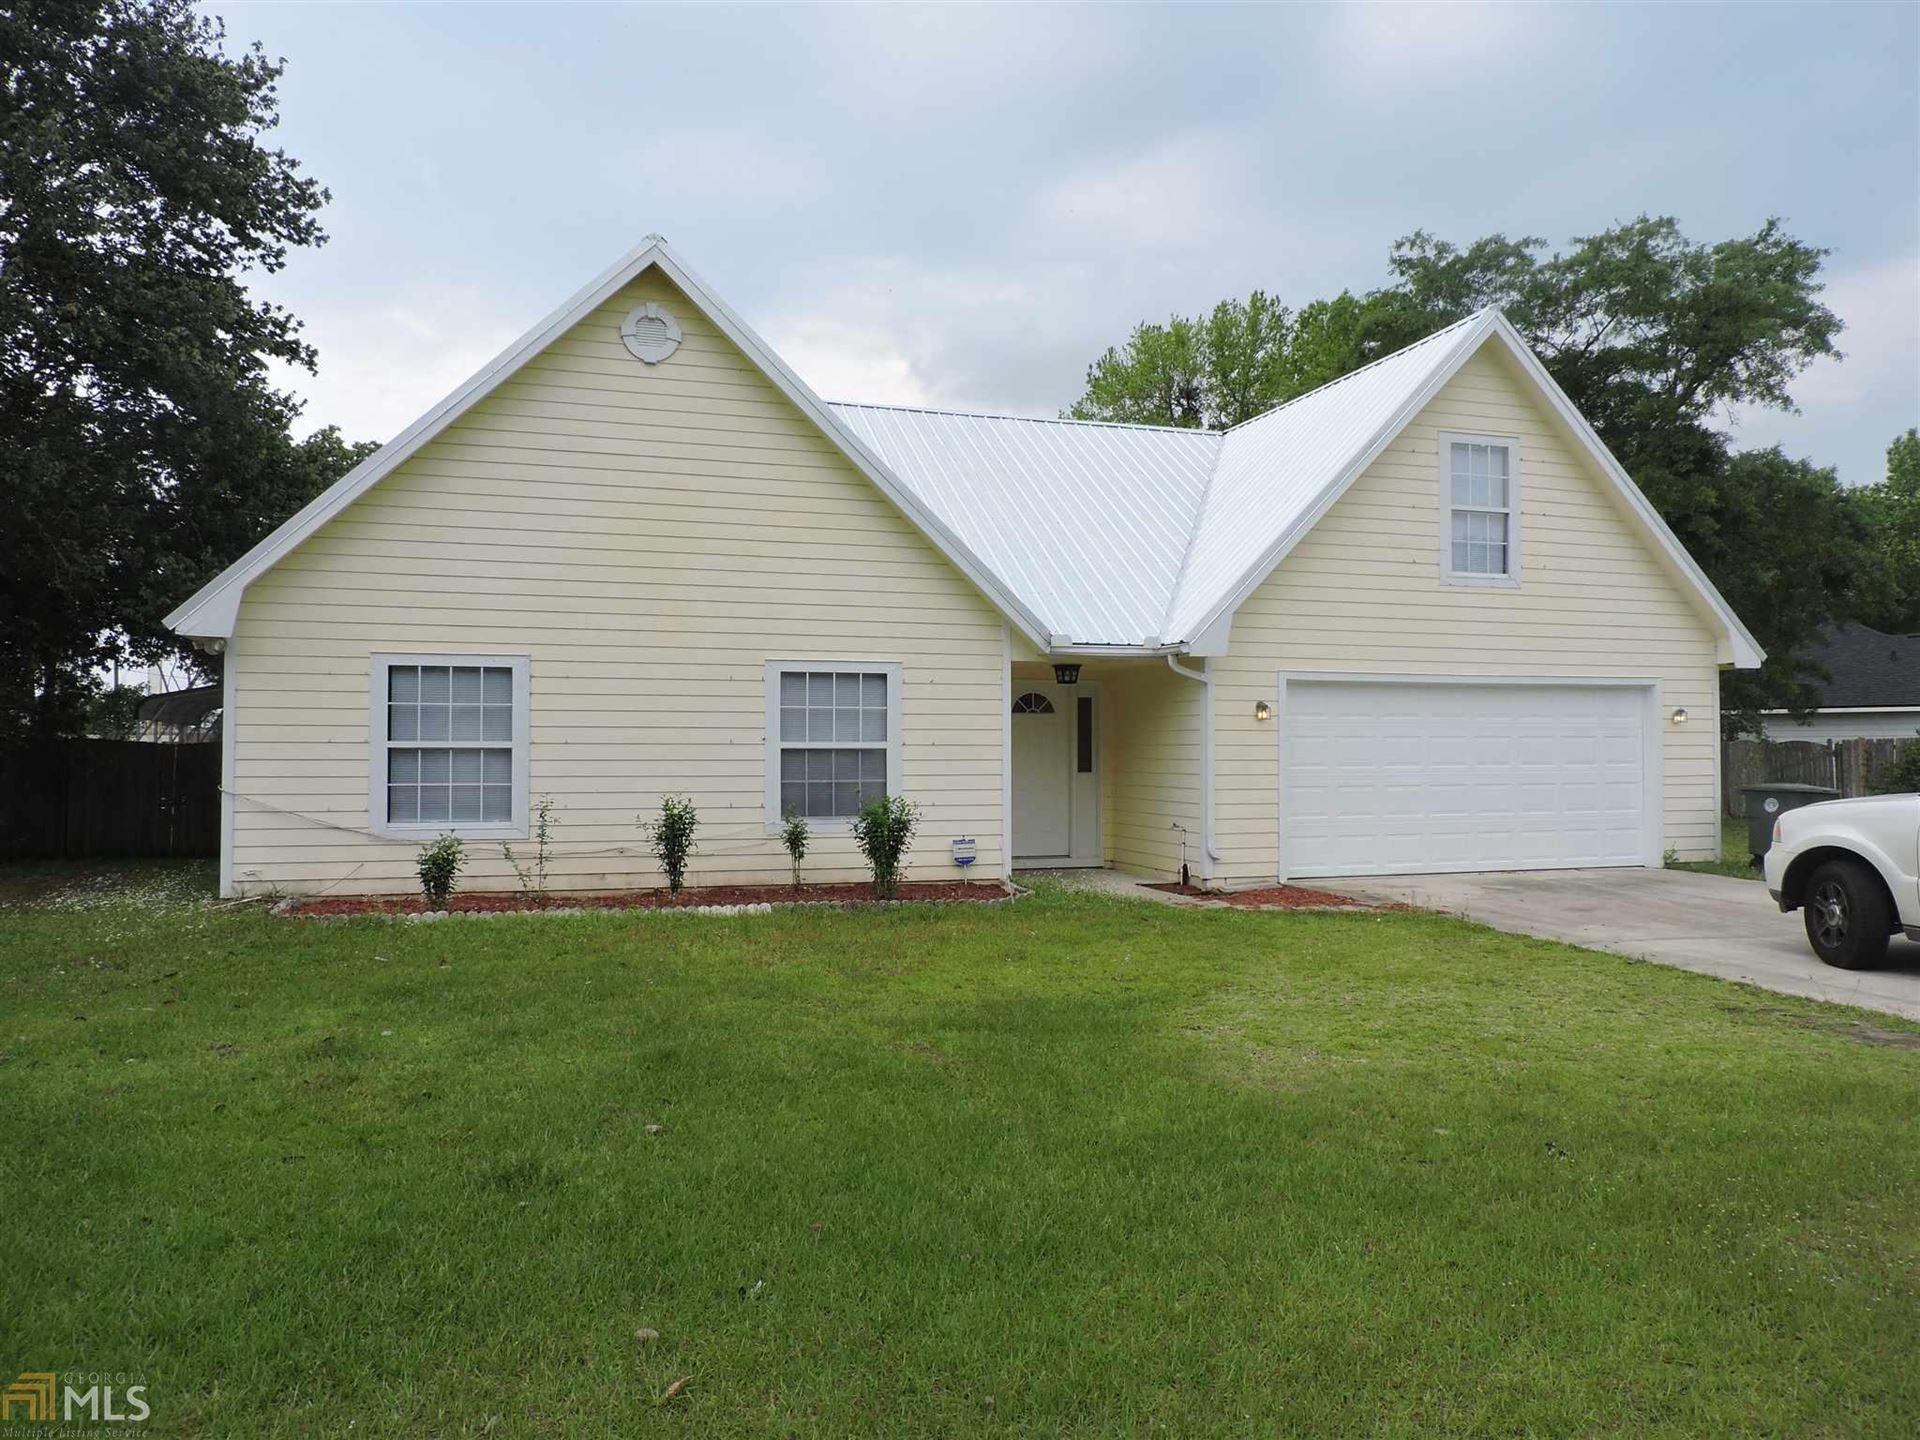 103 Lakefield, Kingsland, GA 31548 - MLS#: 8811476